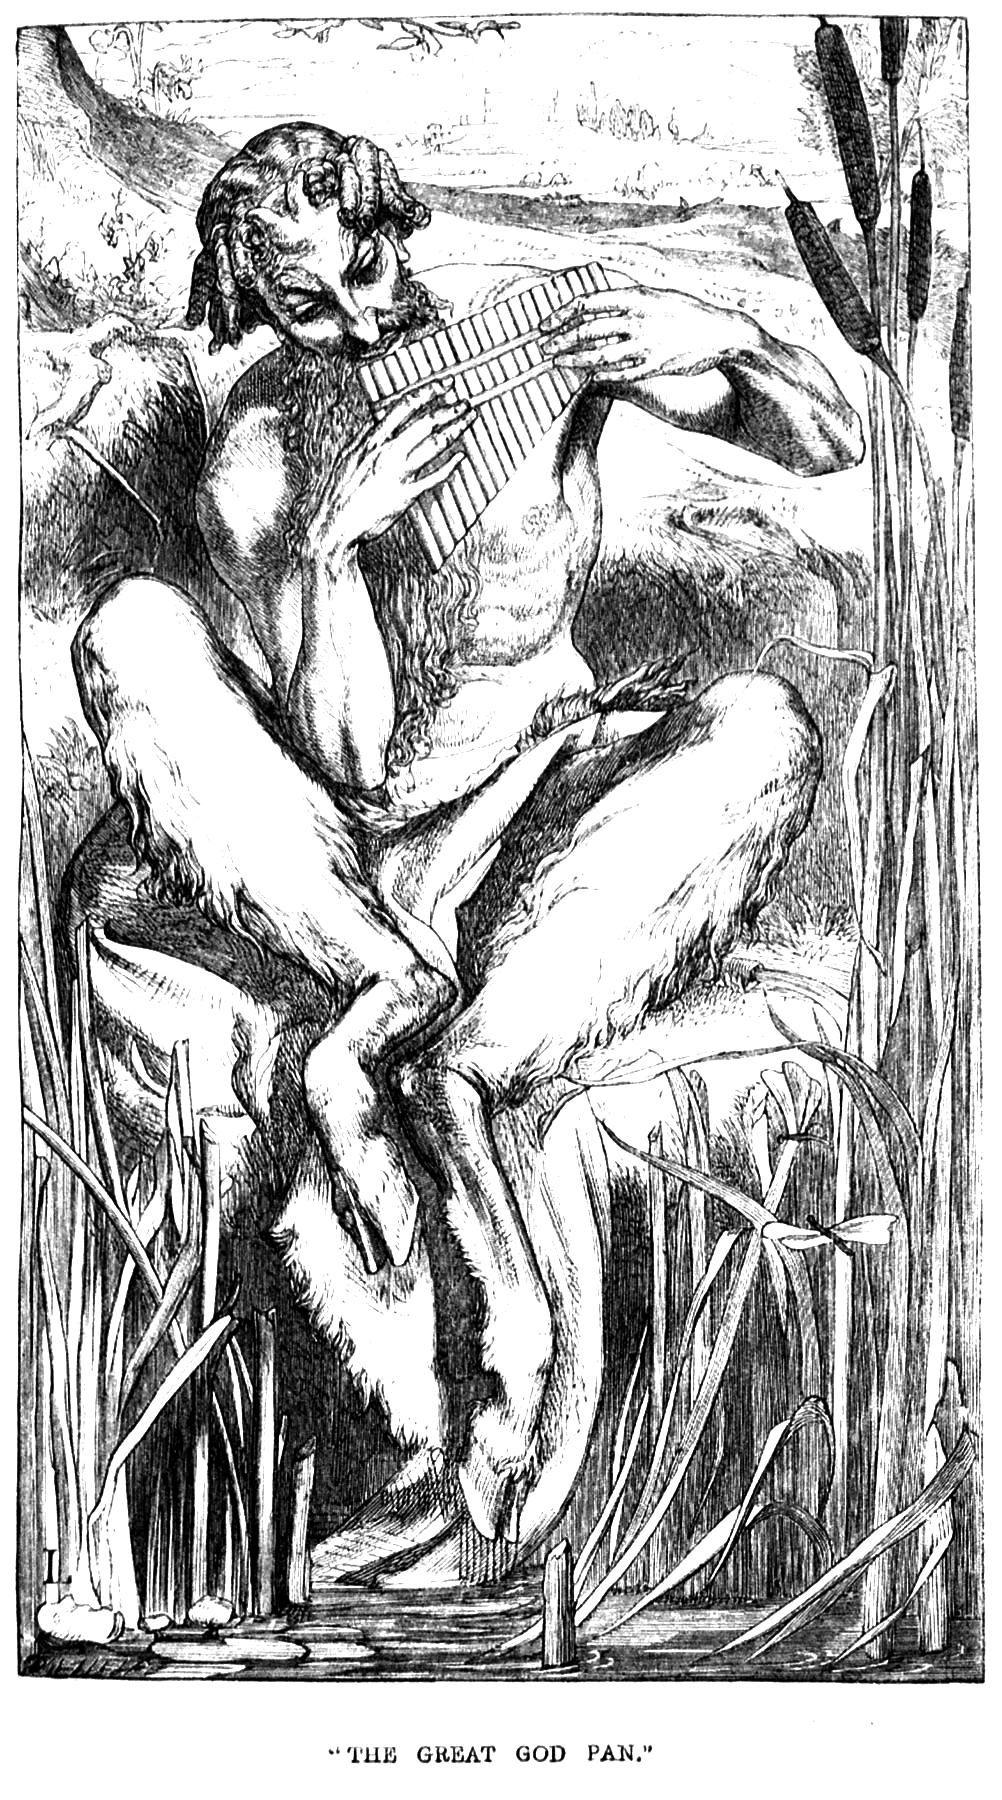 Priapus fauno faun pan priapus pinterest pagan gods priapus fauno faun pan priapus pinterest pagan gods human body and mythology buycottarizona